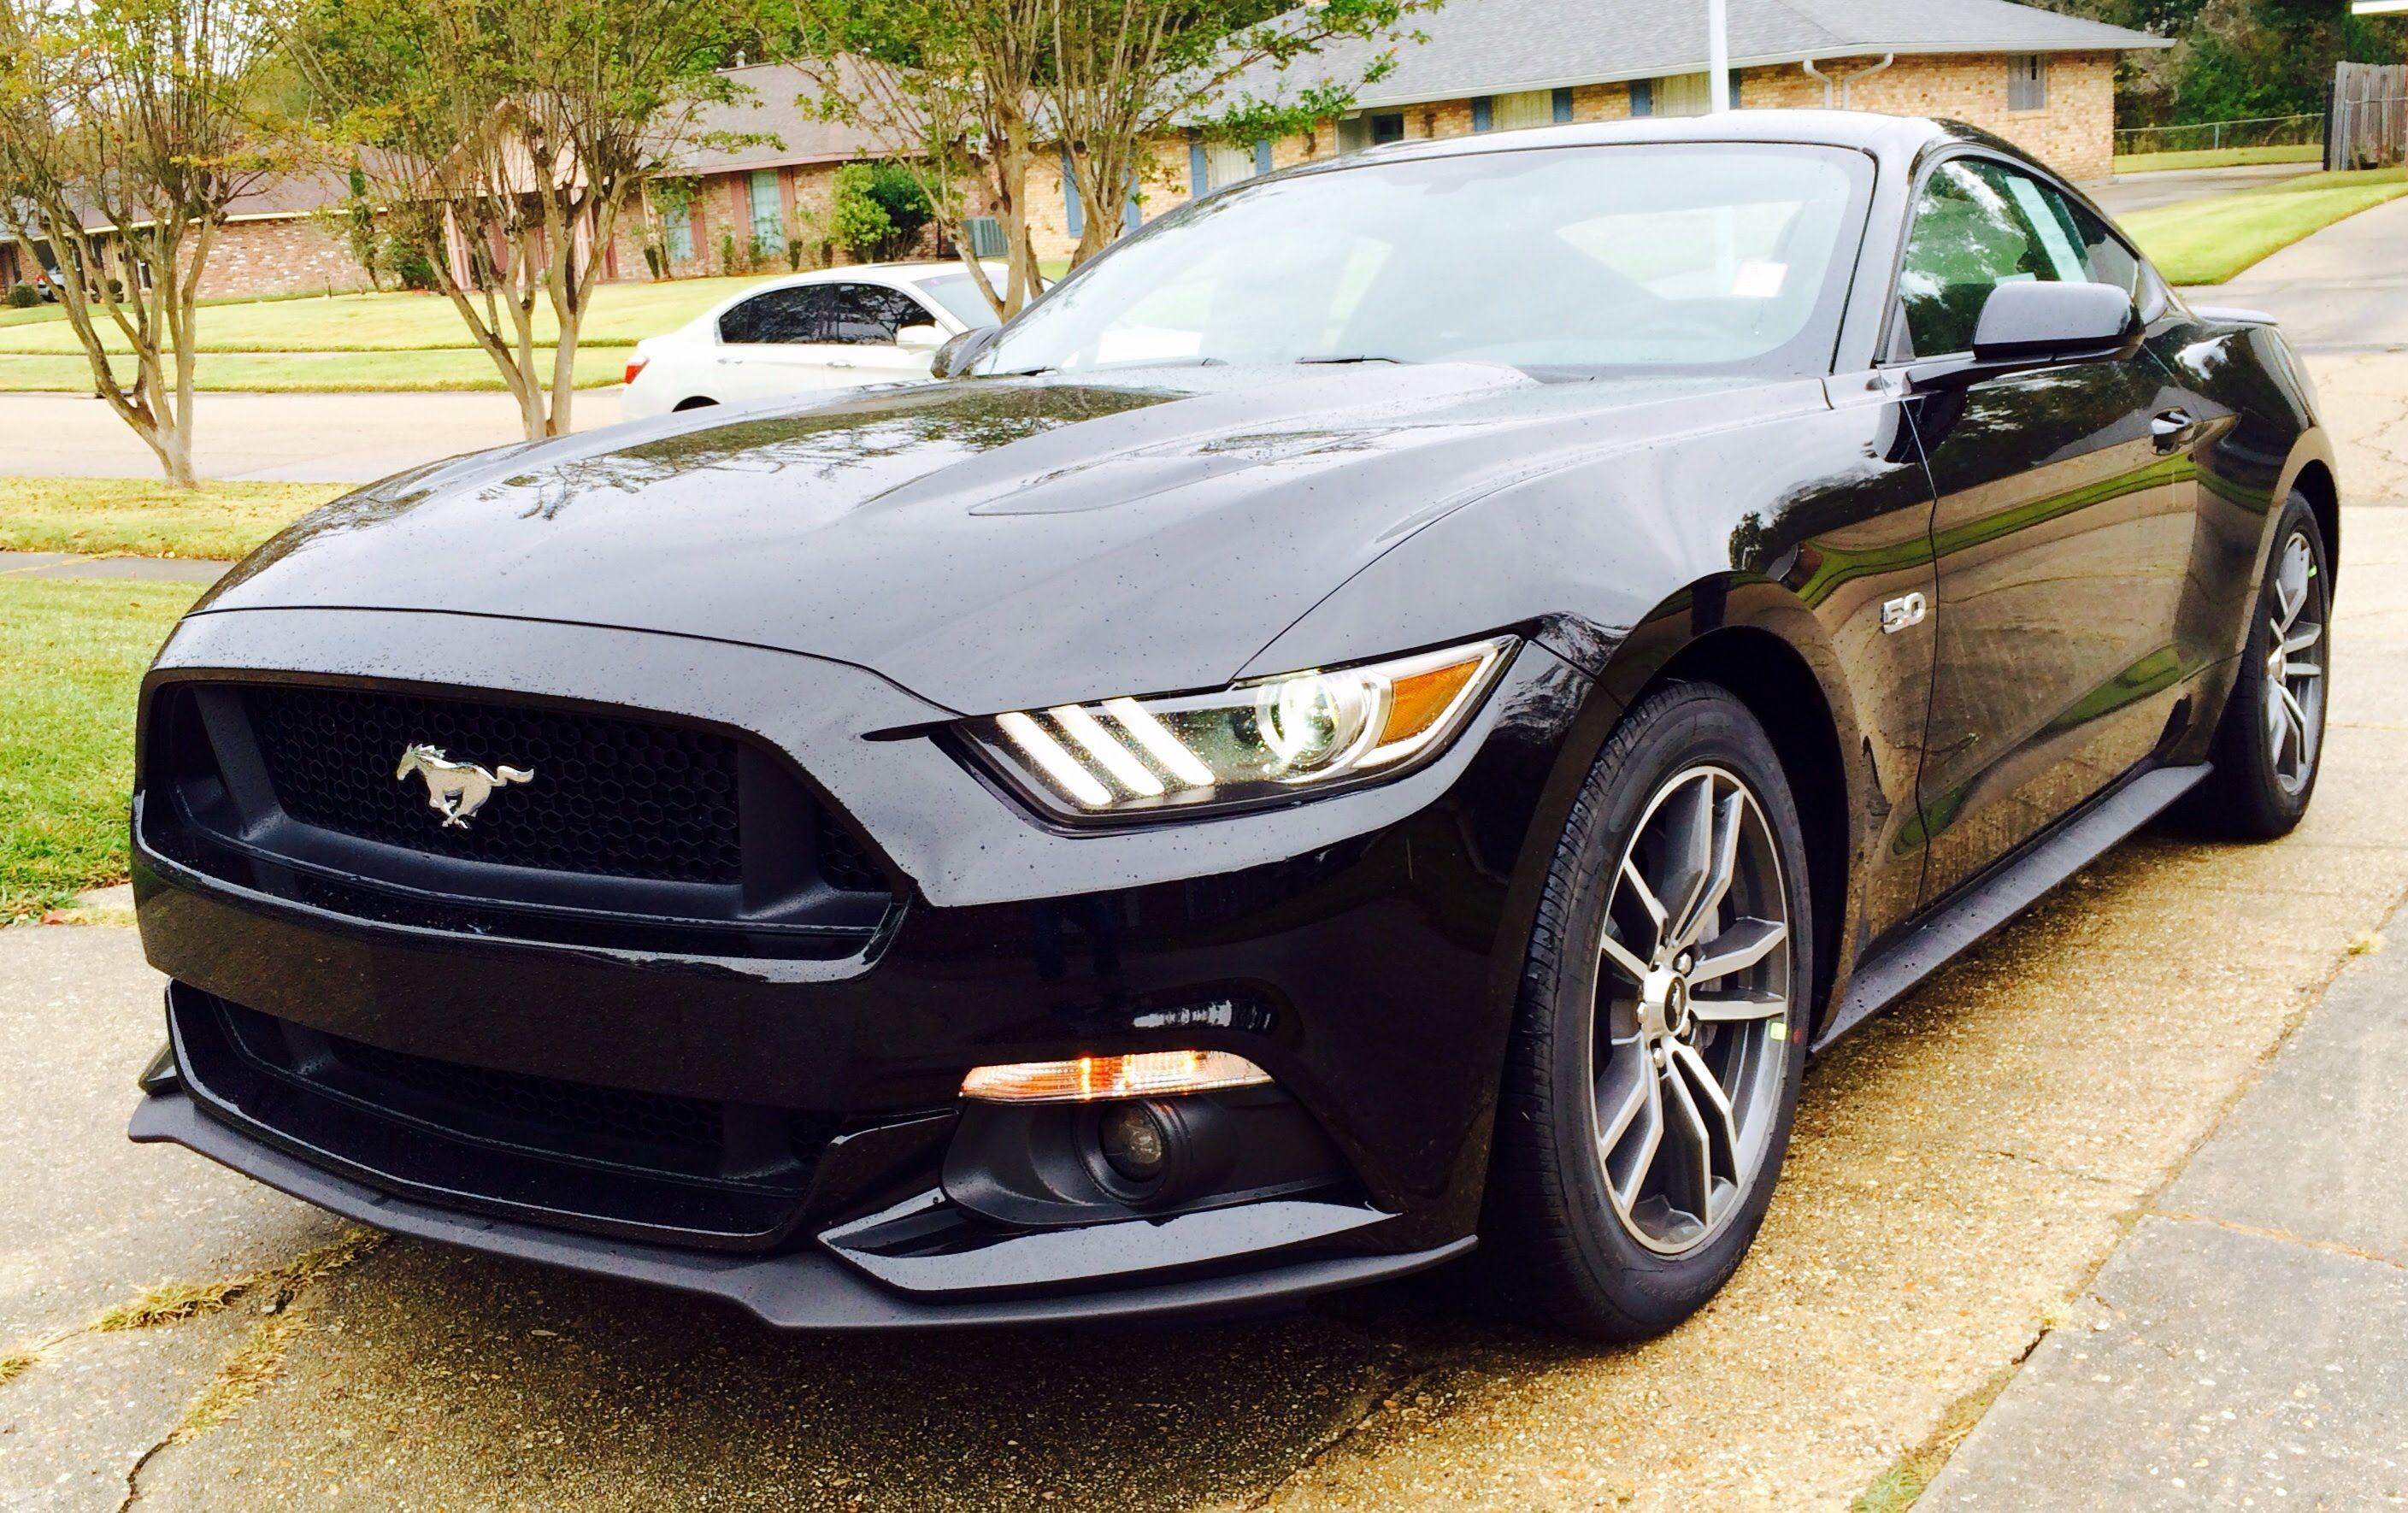 2015 2016 Ford Mustang Gt Fastback 5 0l V8 Full Review Test